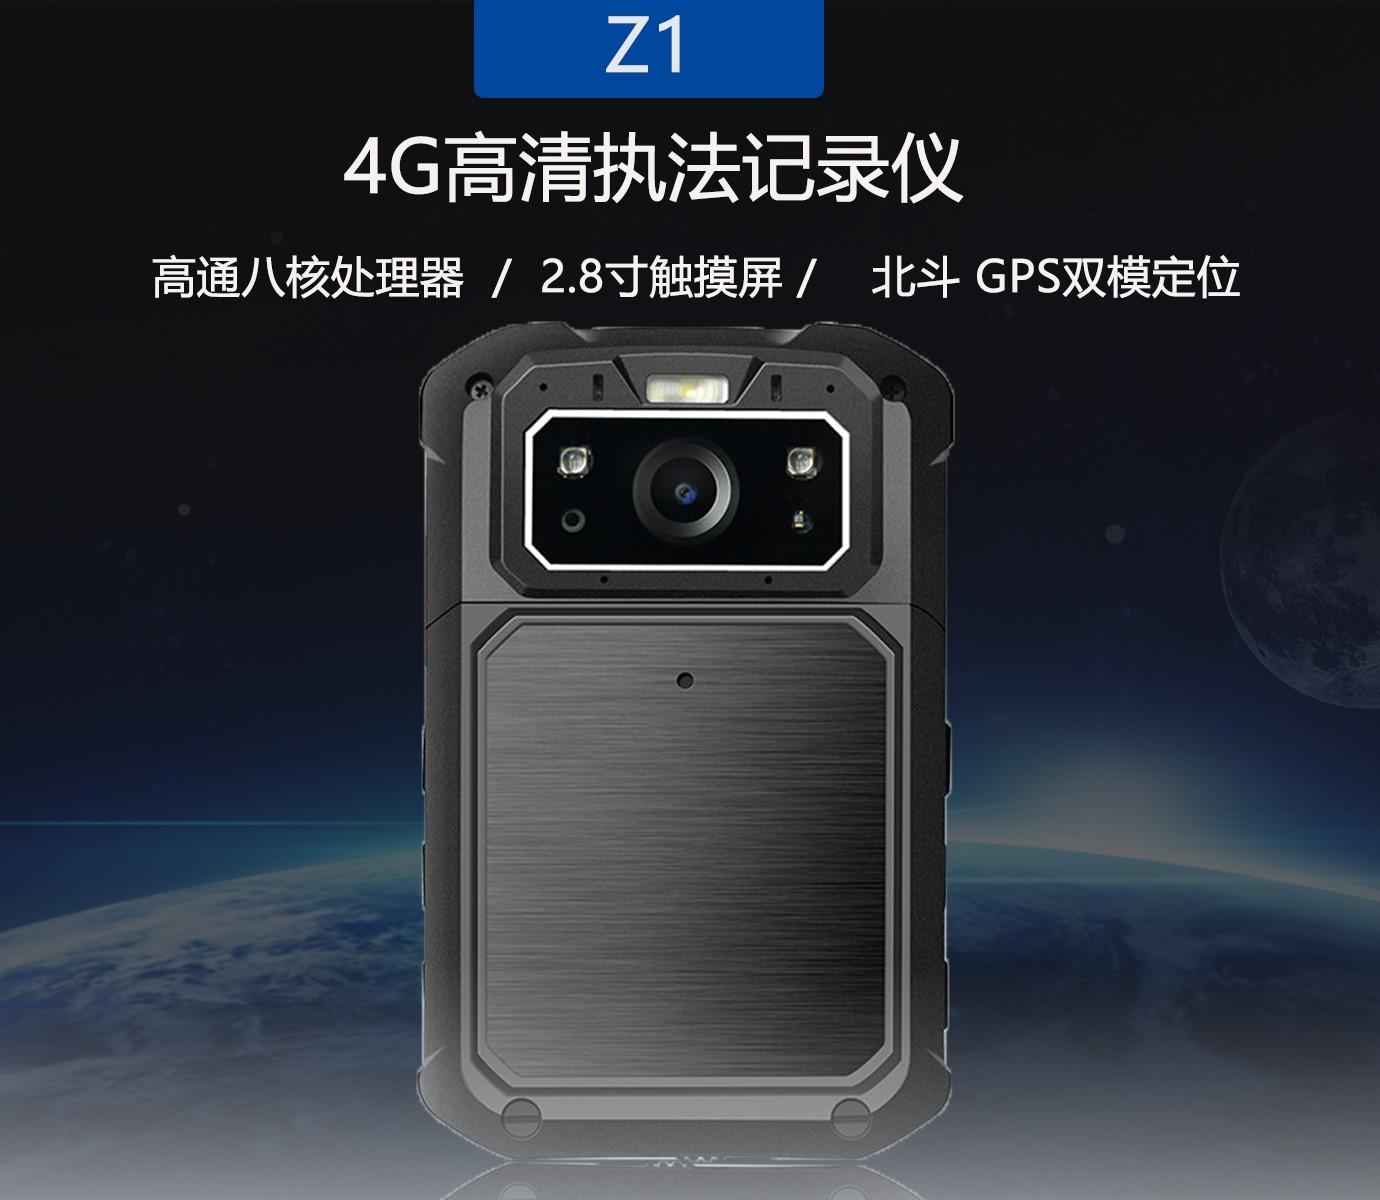 4G高清执法仪.jpg